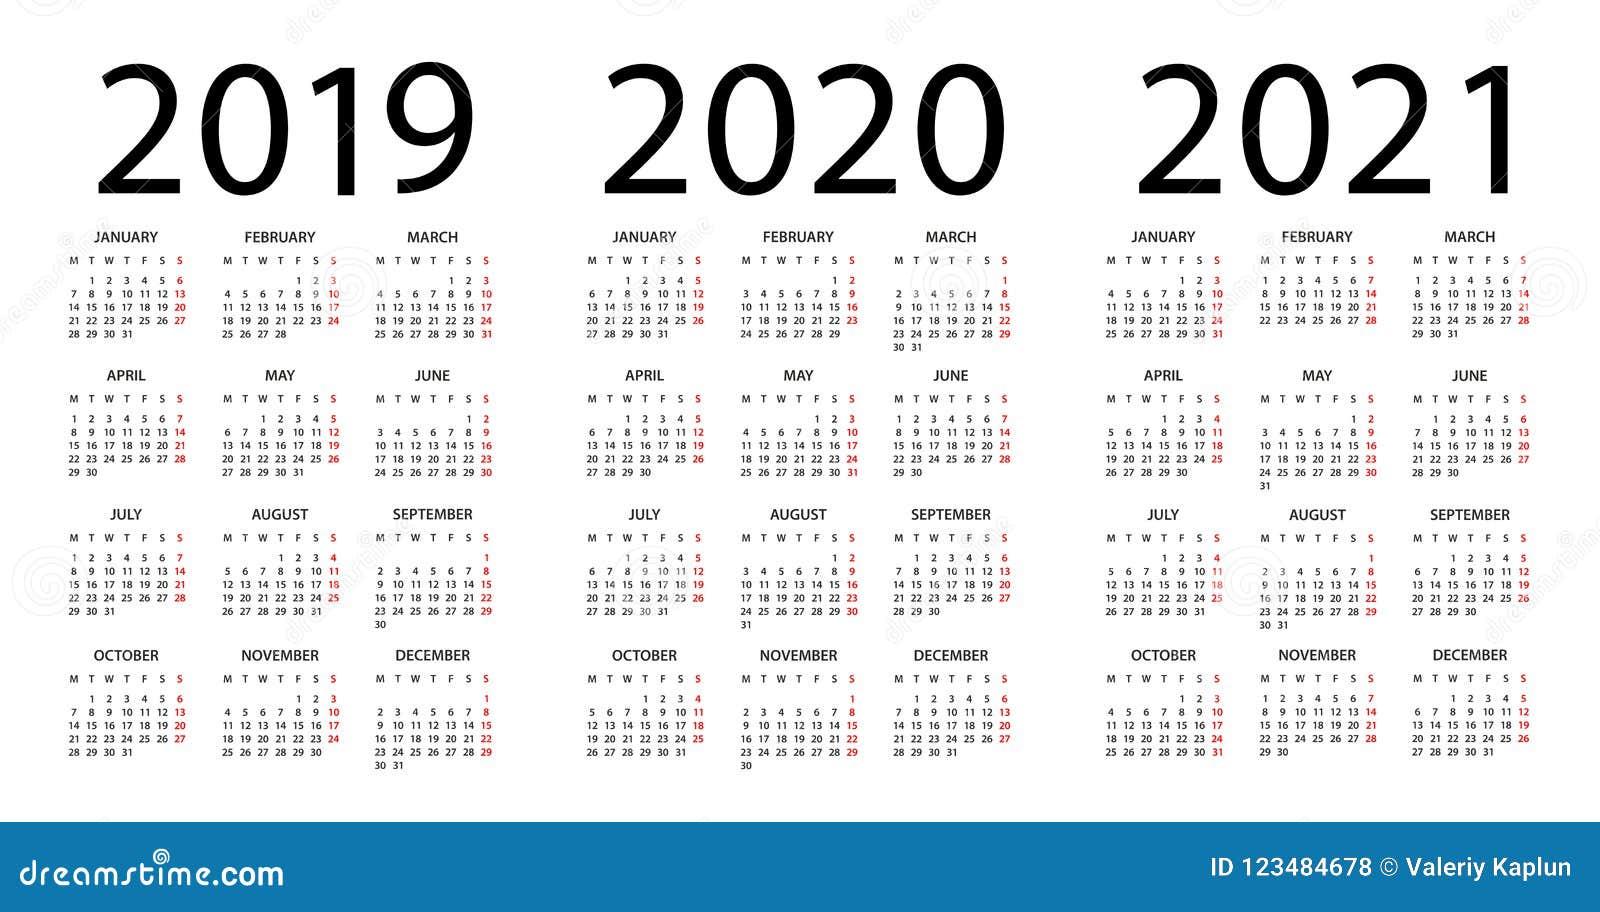 Calendar 2019 2020 2021 - illustration. Week starts on Monday